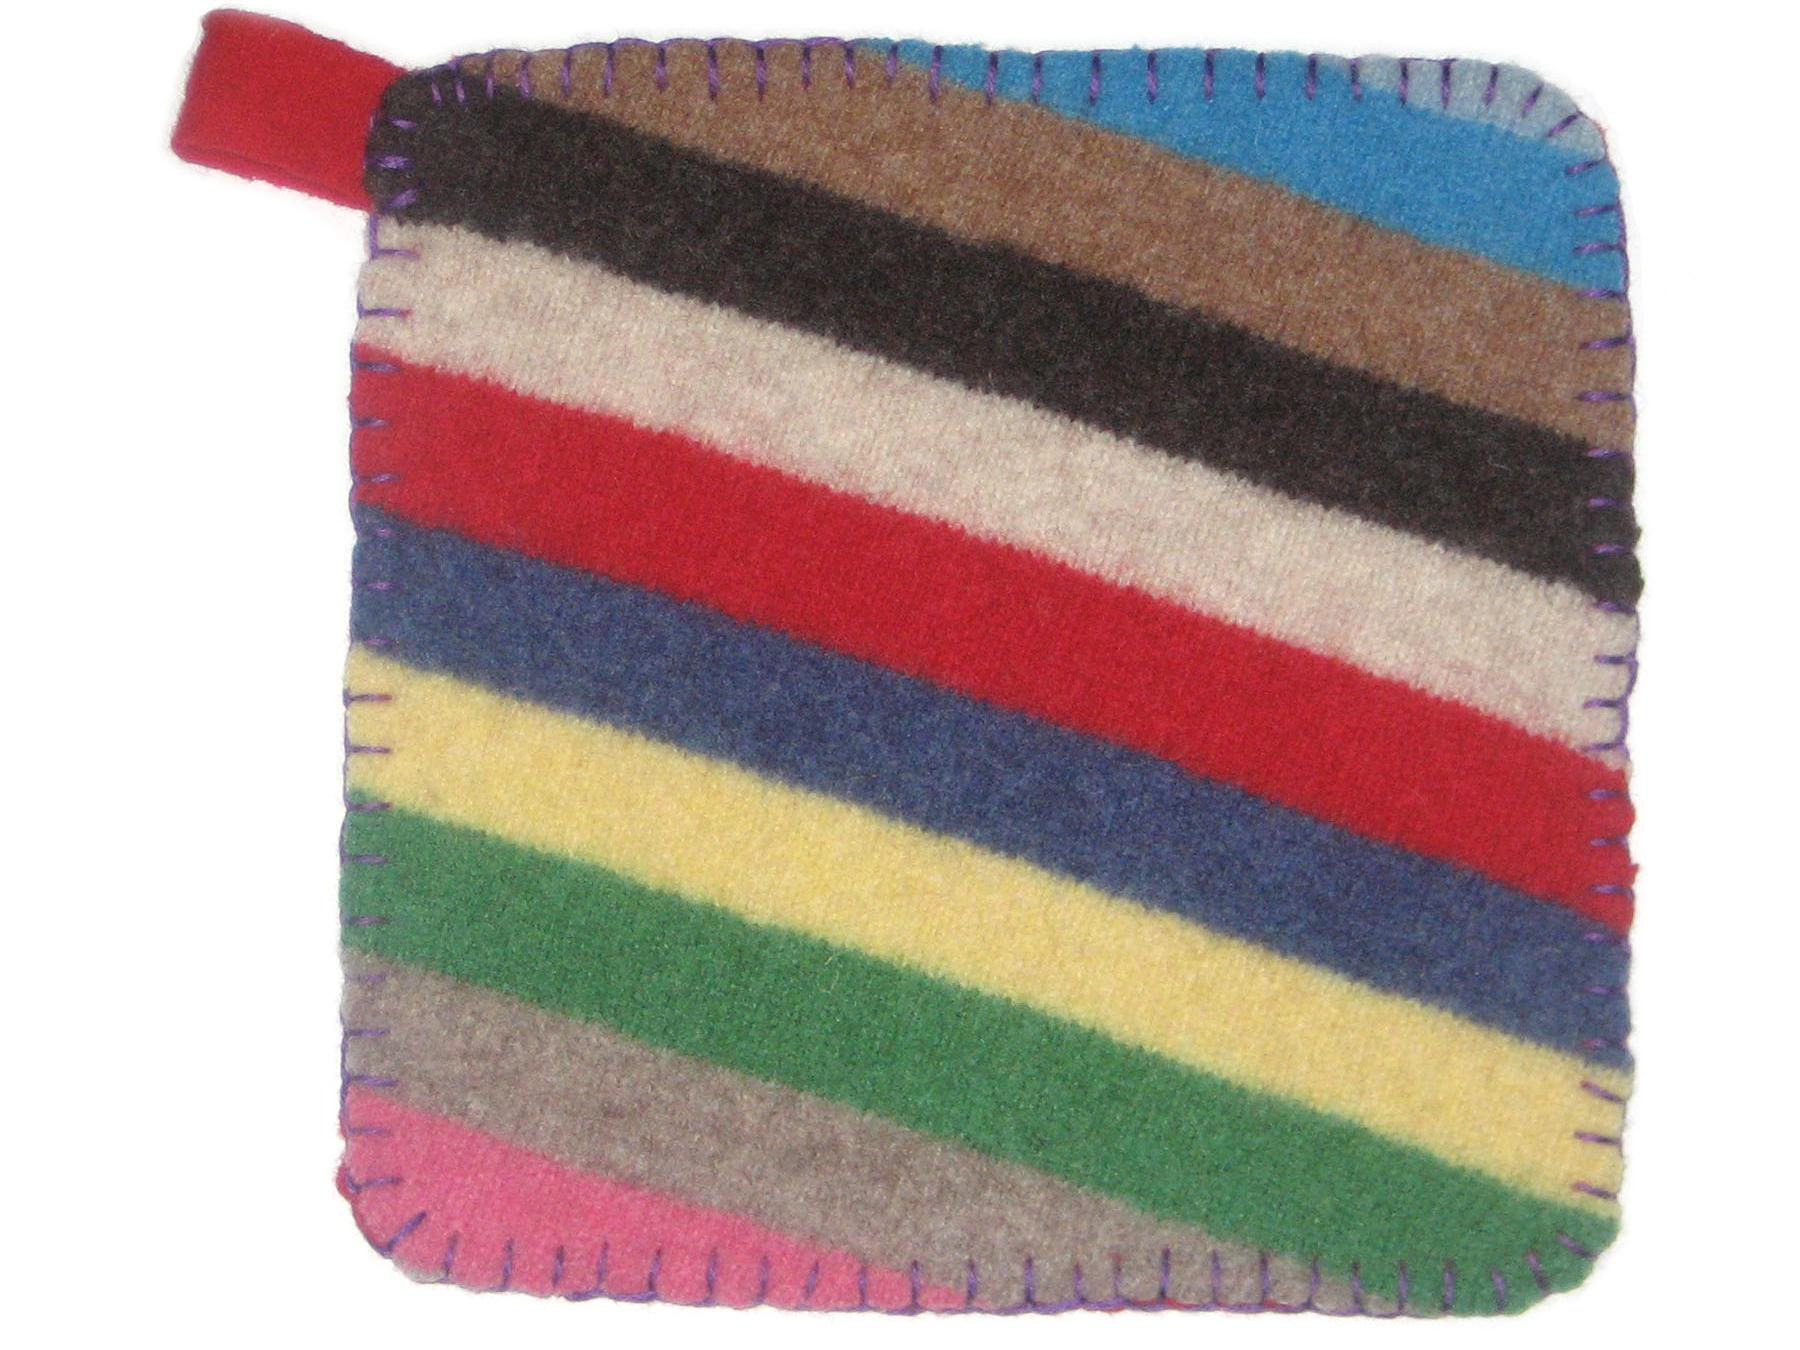 Felted Sweater Potholder